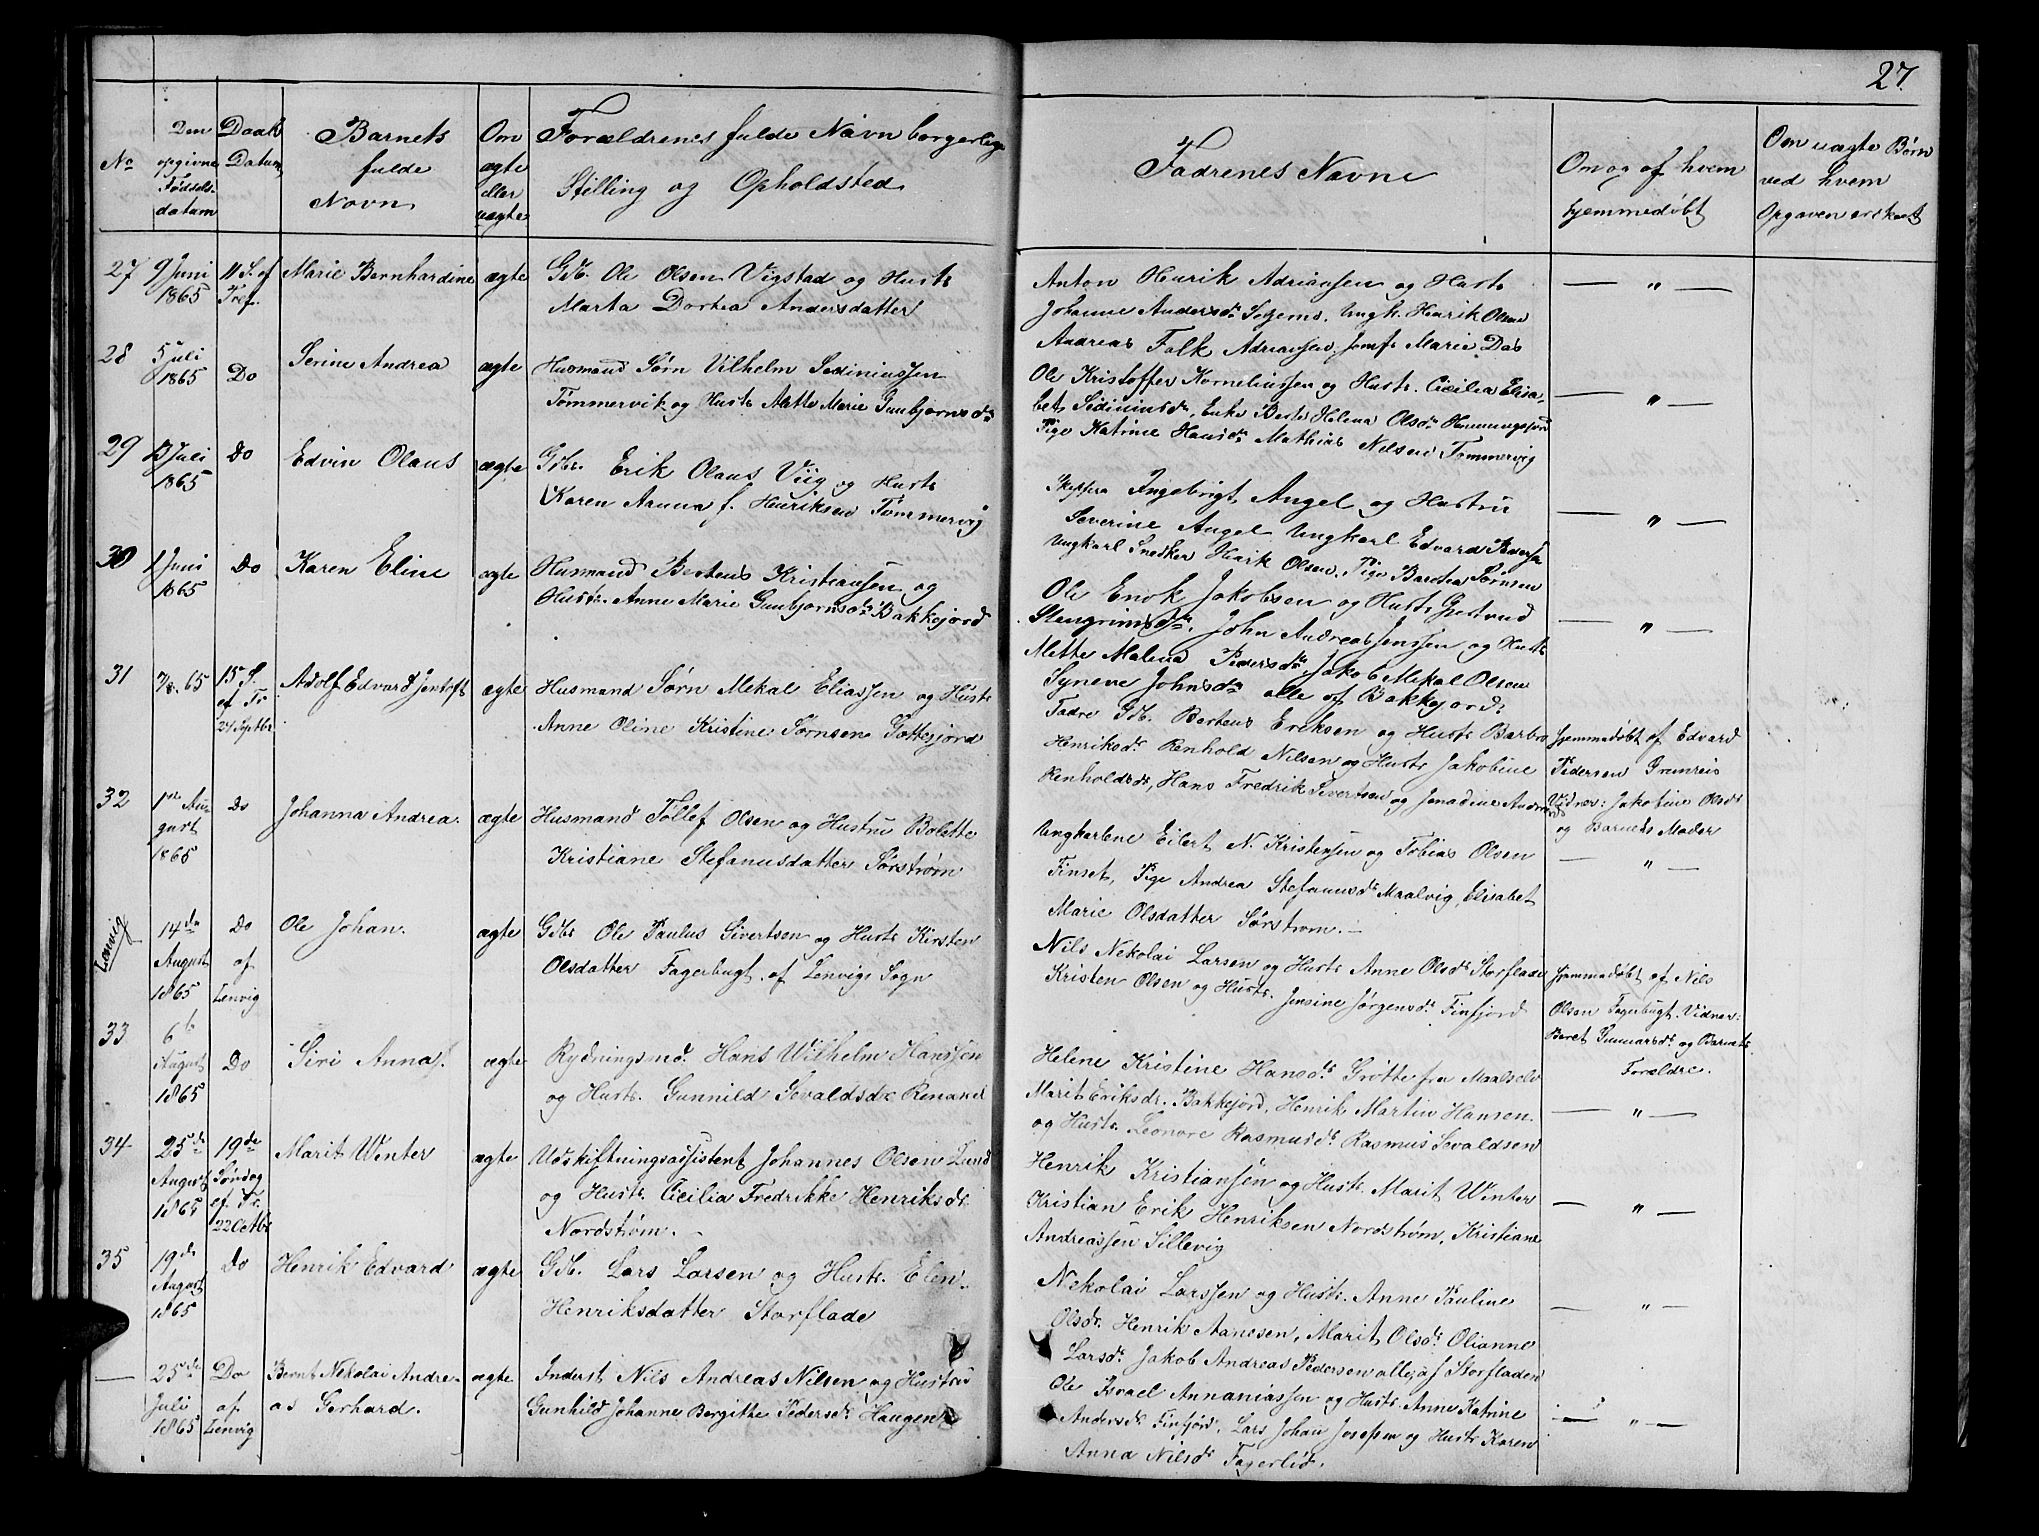 SATØ, Tranøy sokneprestkontor, I/Ia/Iab/L0021klokker: Klokkerbok nr. 21, 1861-1886, s. 27